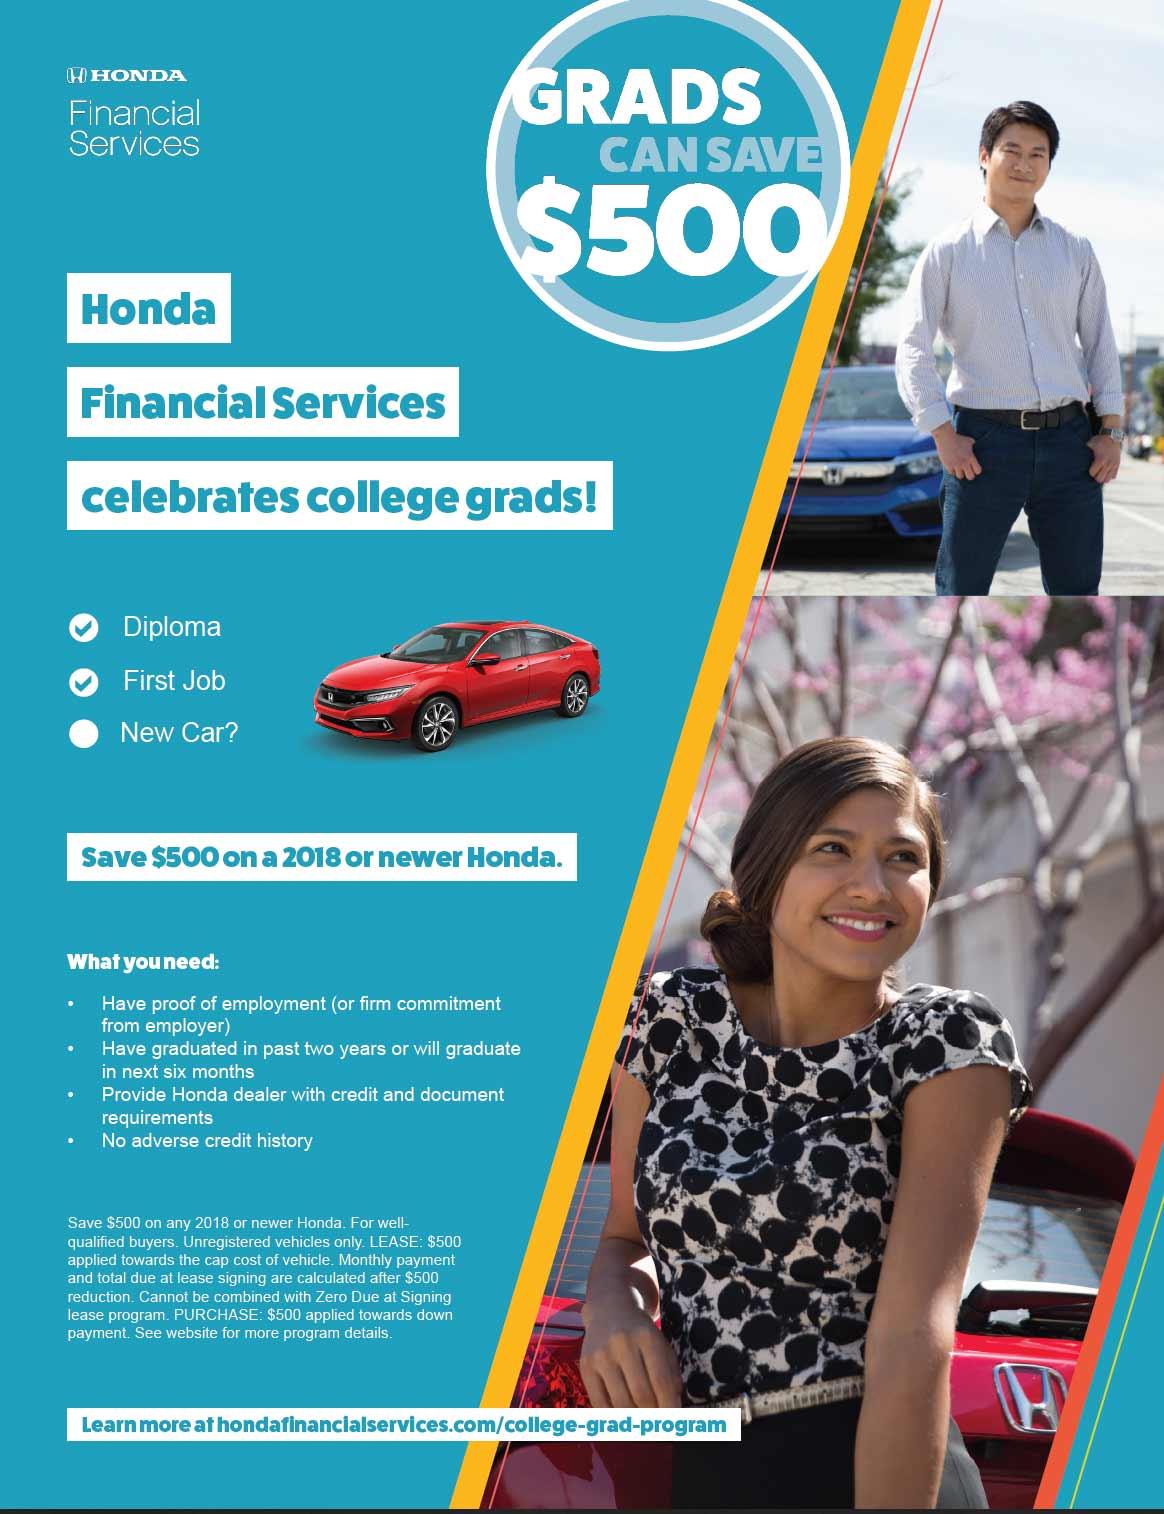 Bonus Cash On Your New Honda For College Grads